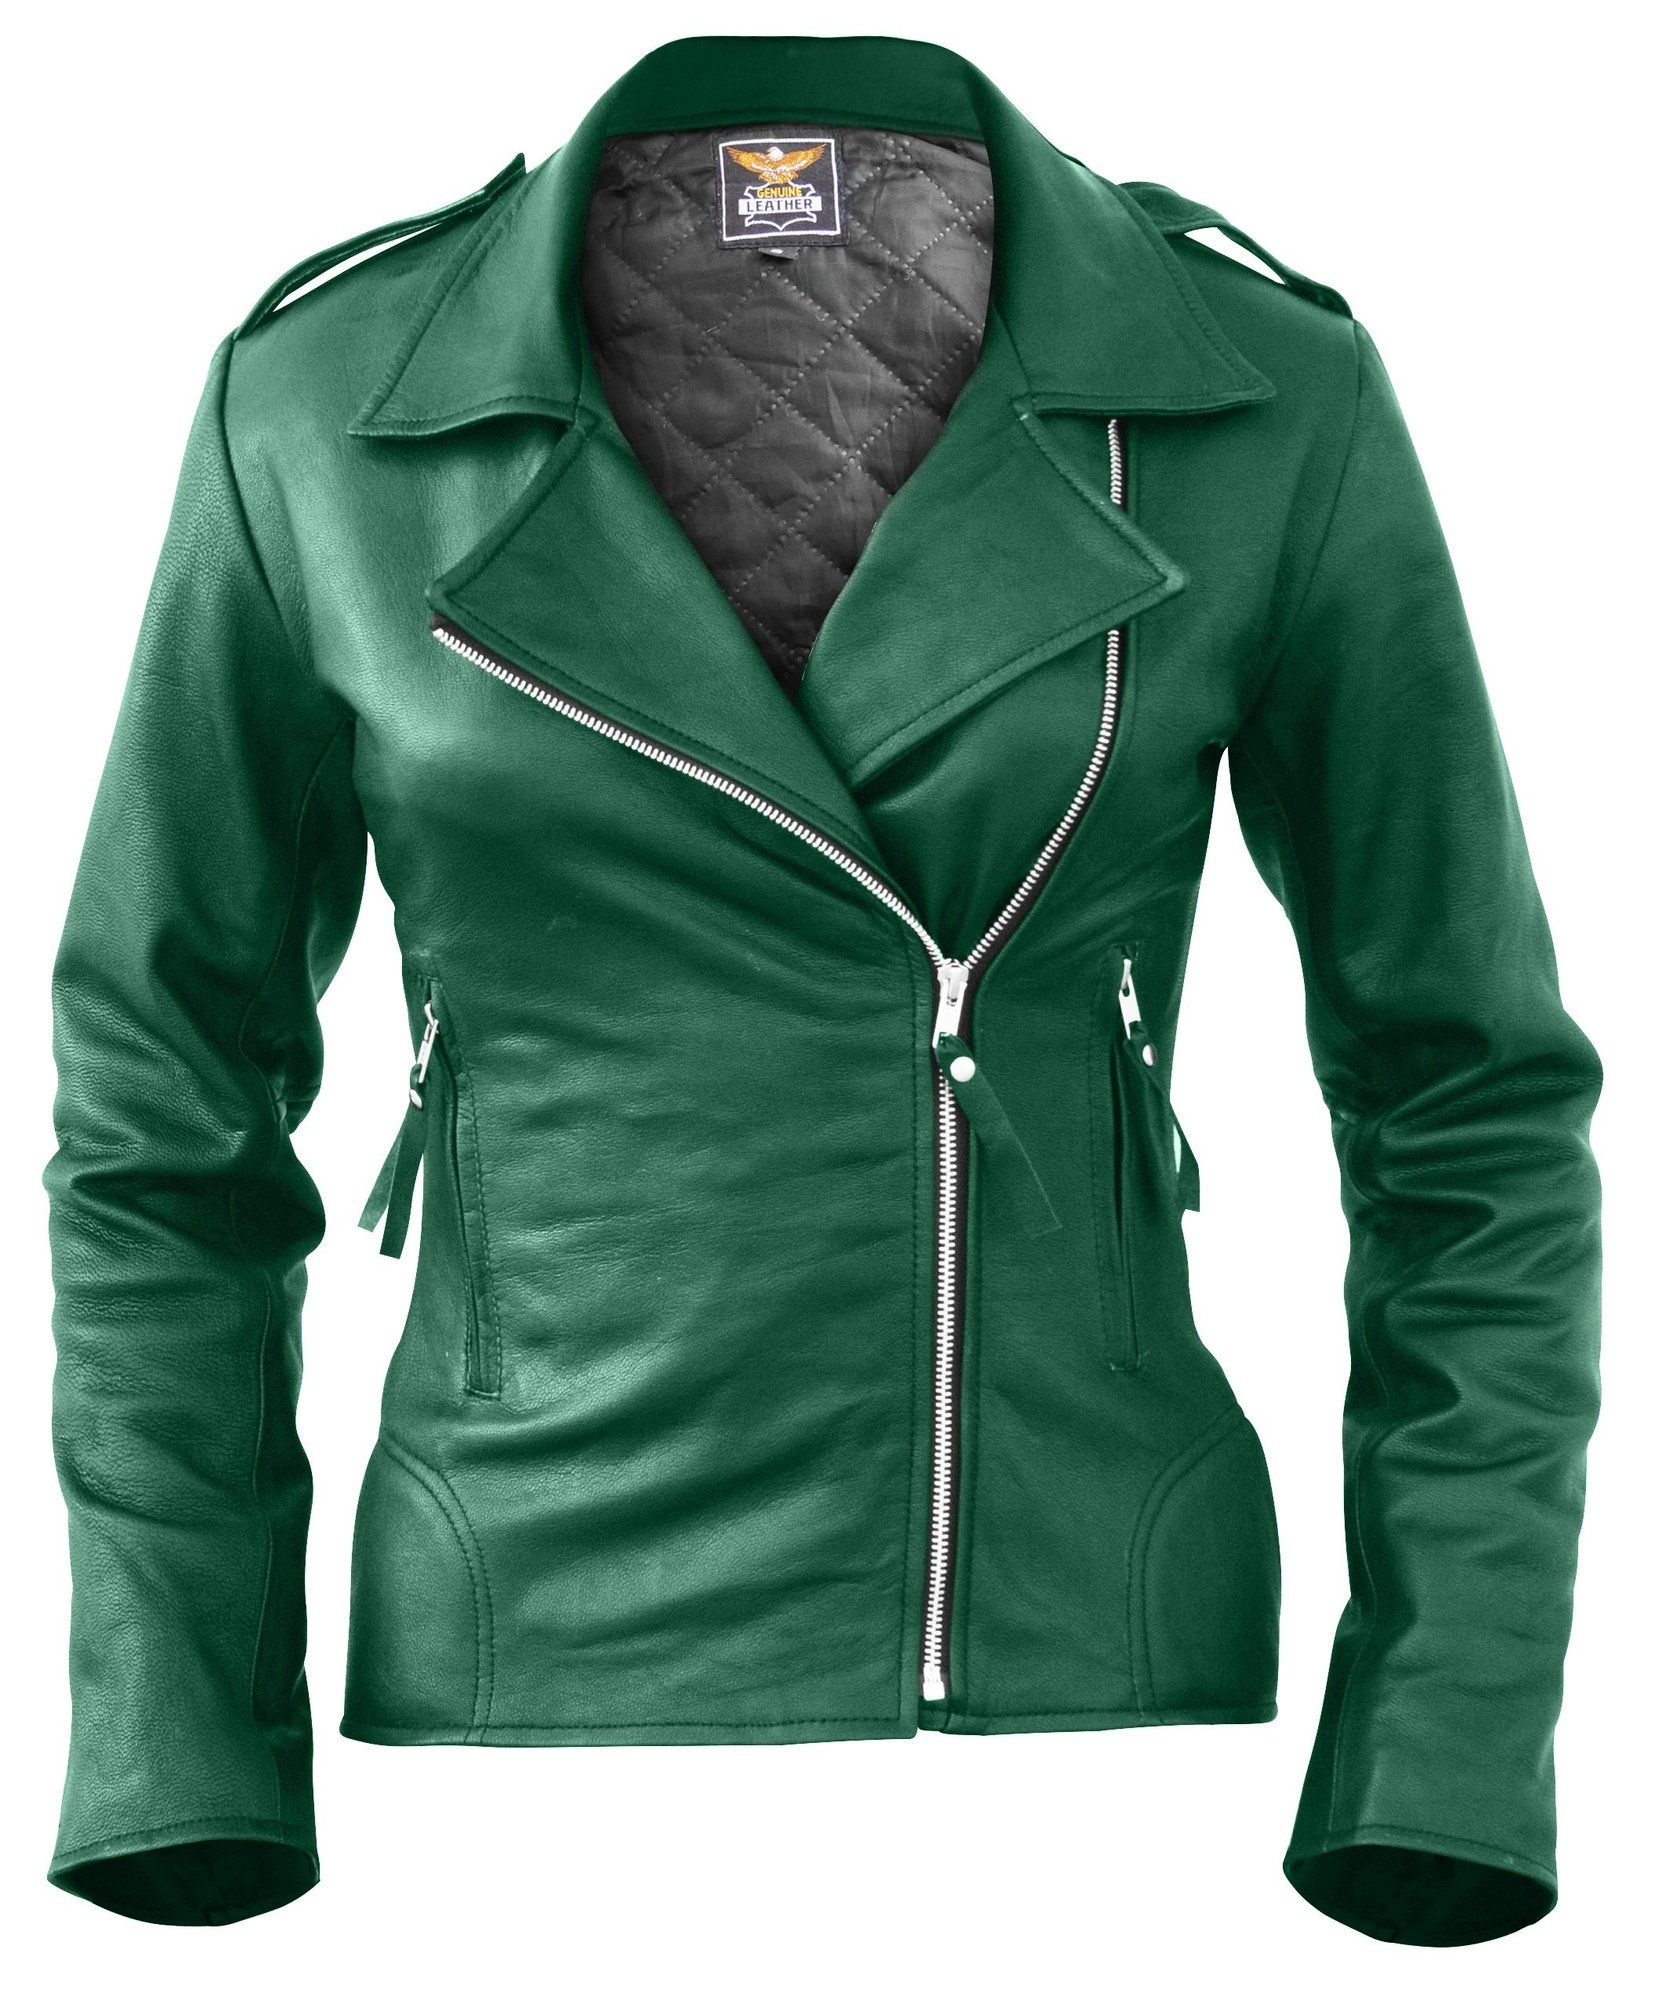 Leather Skin Women Green Brando Genuine Leather Jacket Green Leather Jackets Genuine Leather Jackets Leather Jackets Women [ 2000 x 1655 Pixel ]